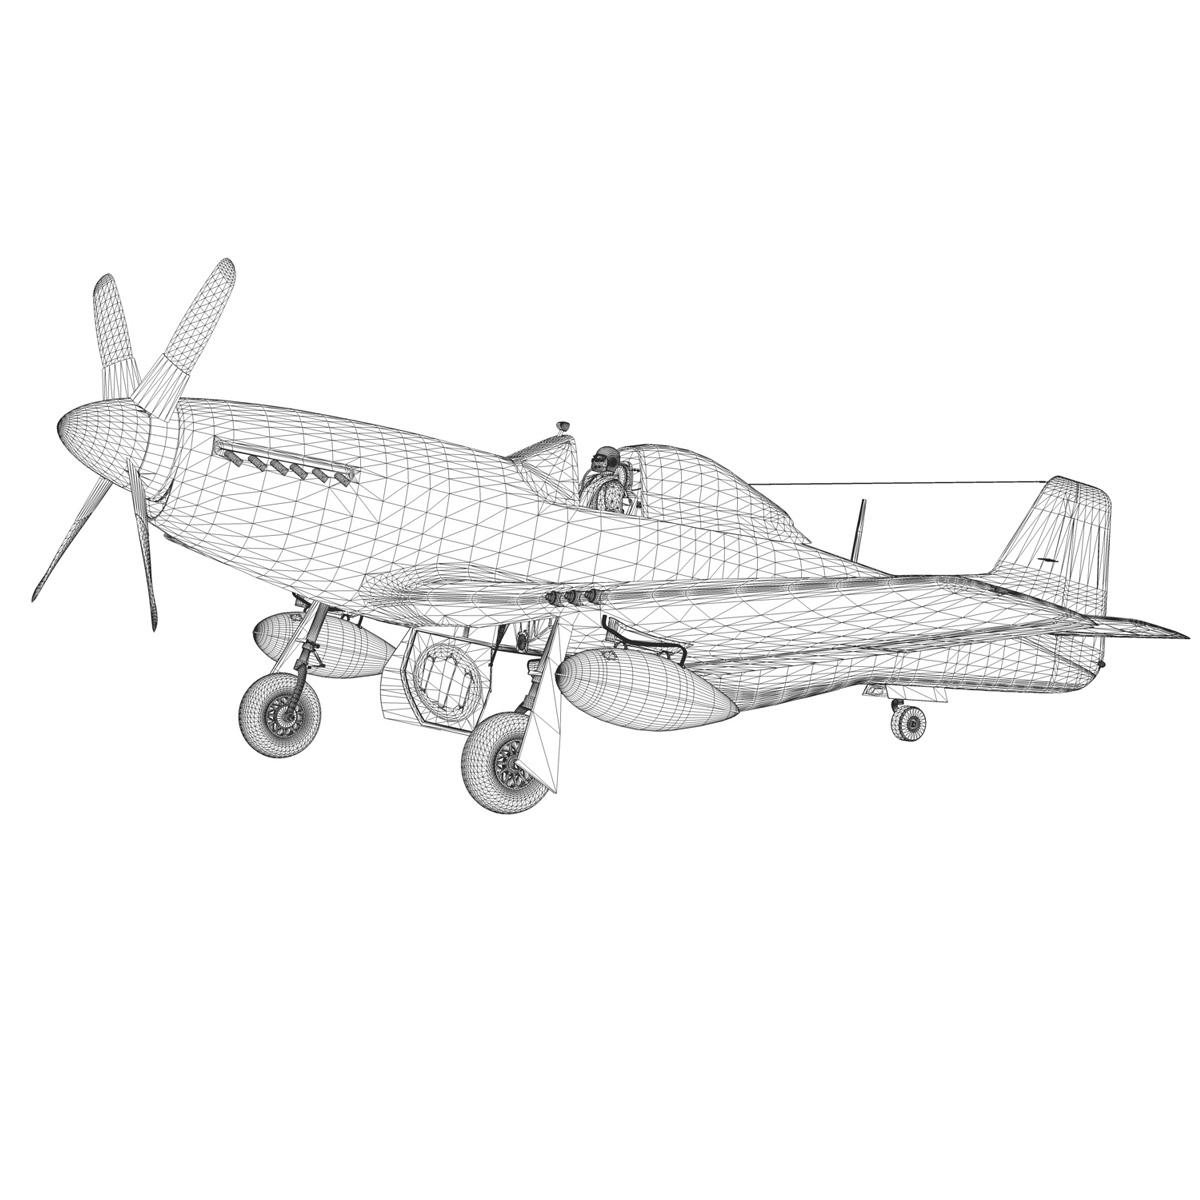 north american p-51k mustang mk.iv – raf 3d model fbx c4d lwo obj 280354